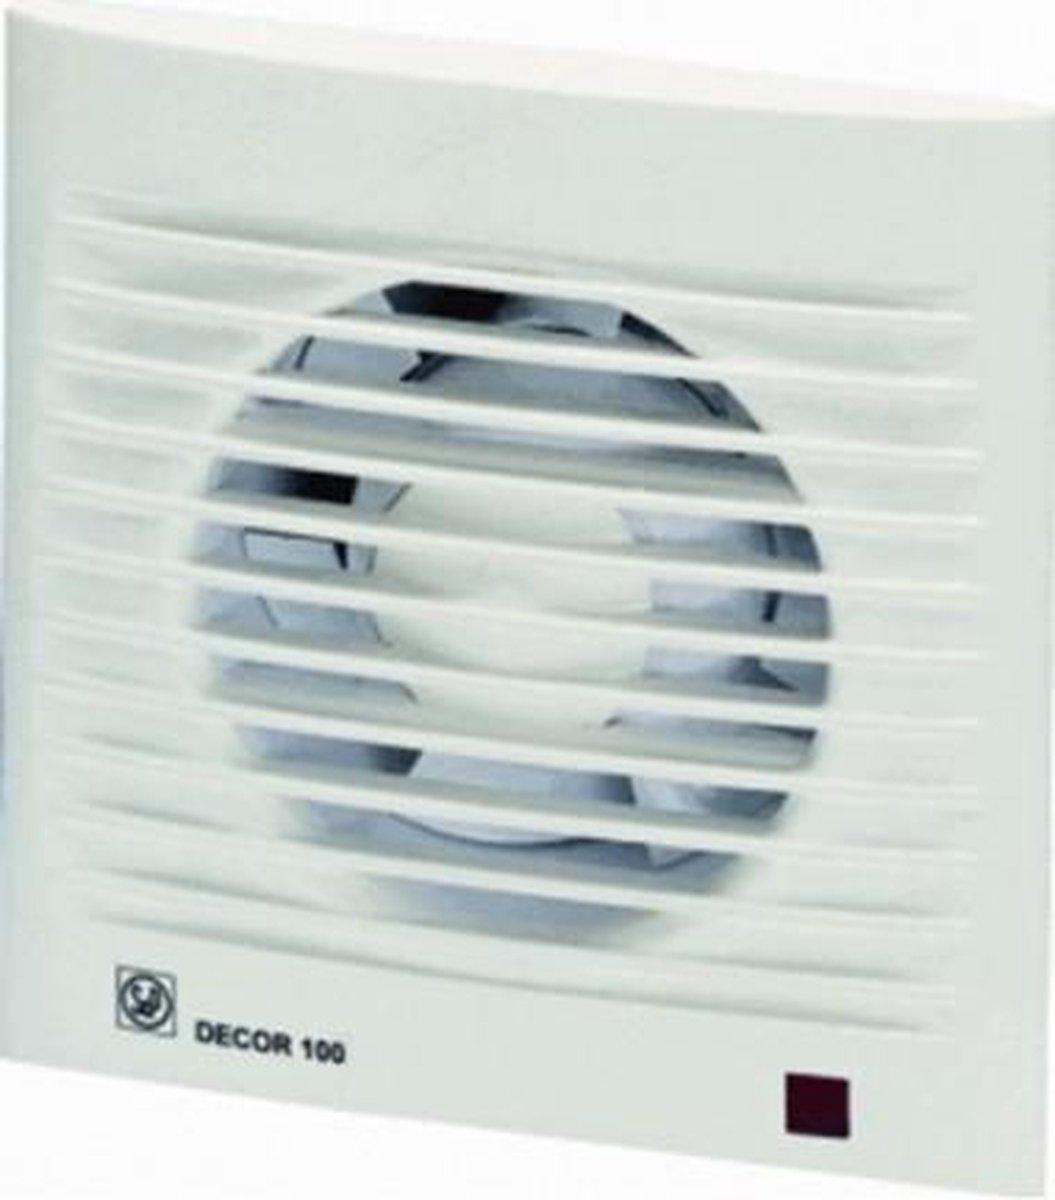 Soler & Palau S+p wc ventilator decor 100cz 95m3h